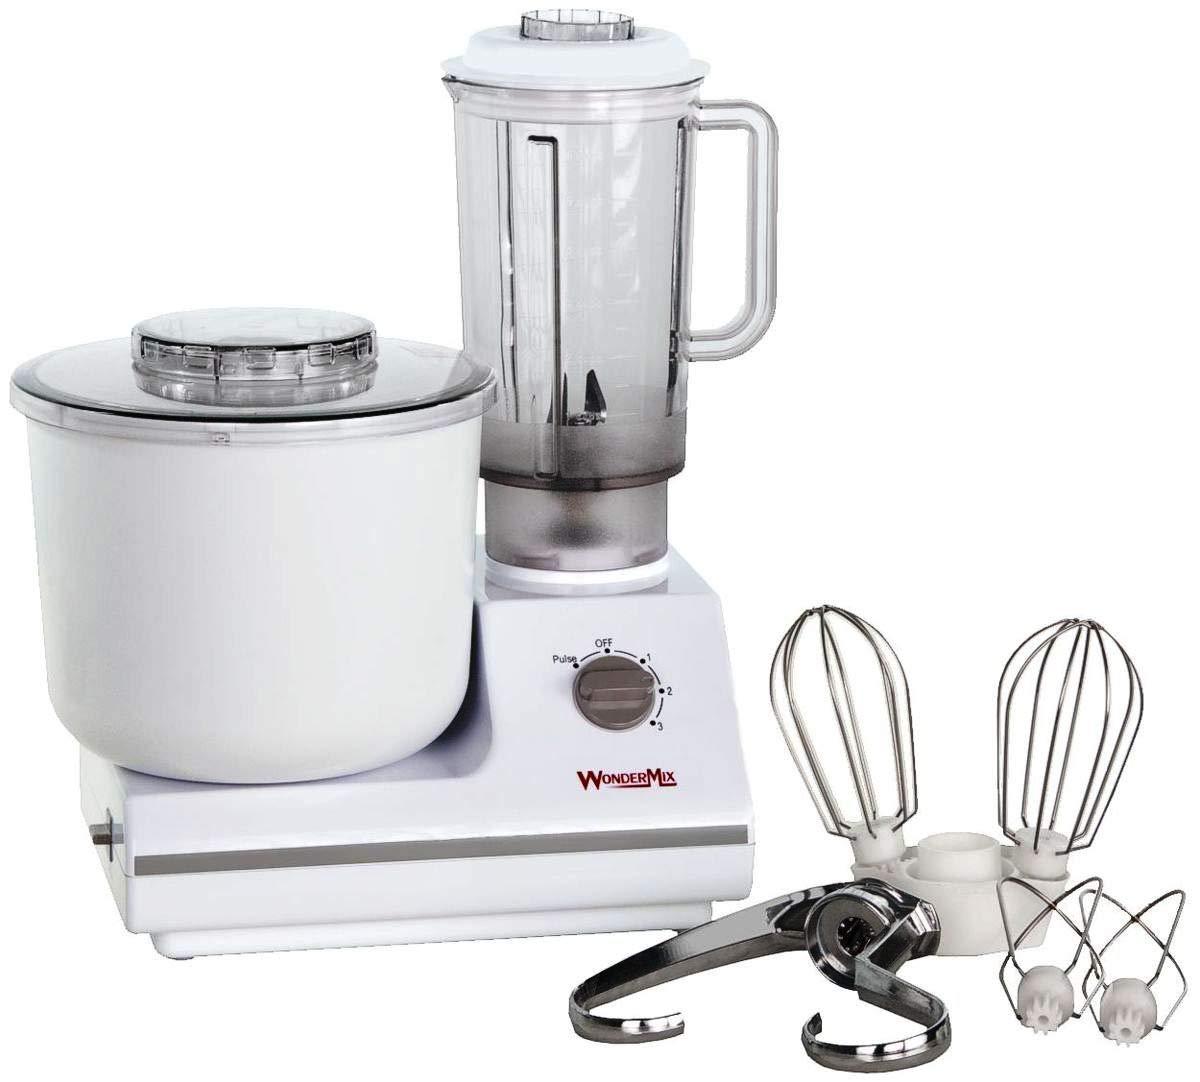 WonderMix Kitchen Mixer - German Design Bread Dough Mixer Machine - Electric Stand Mixer with Bonus Heavy Duty Blender and Attachments High Capacity Bread Mixer by WONDERMILL